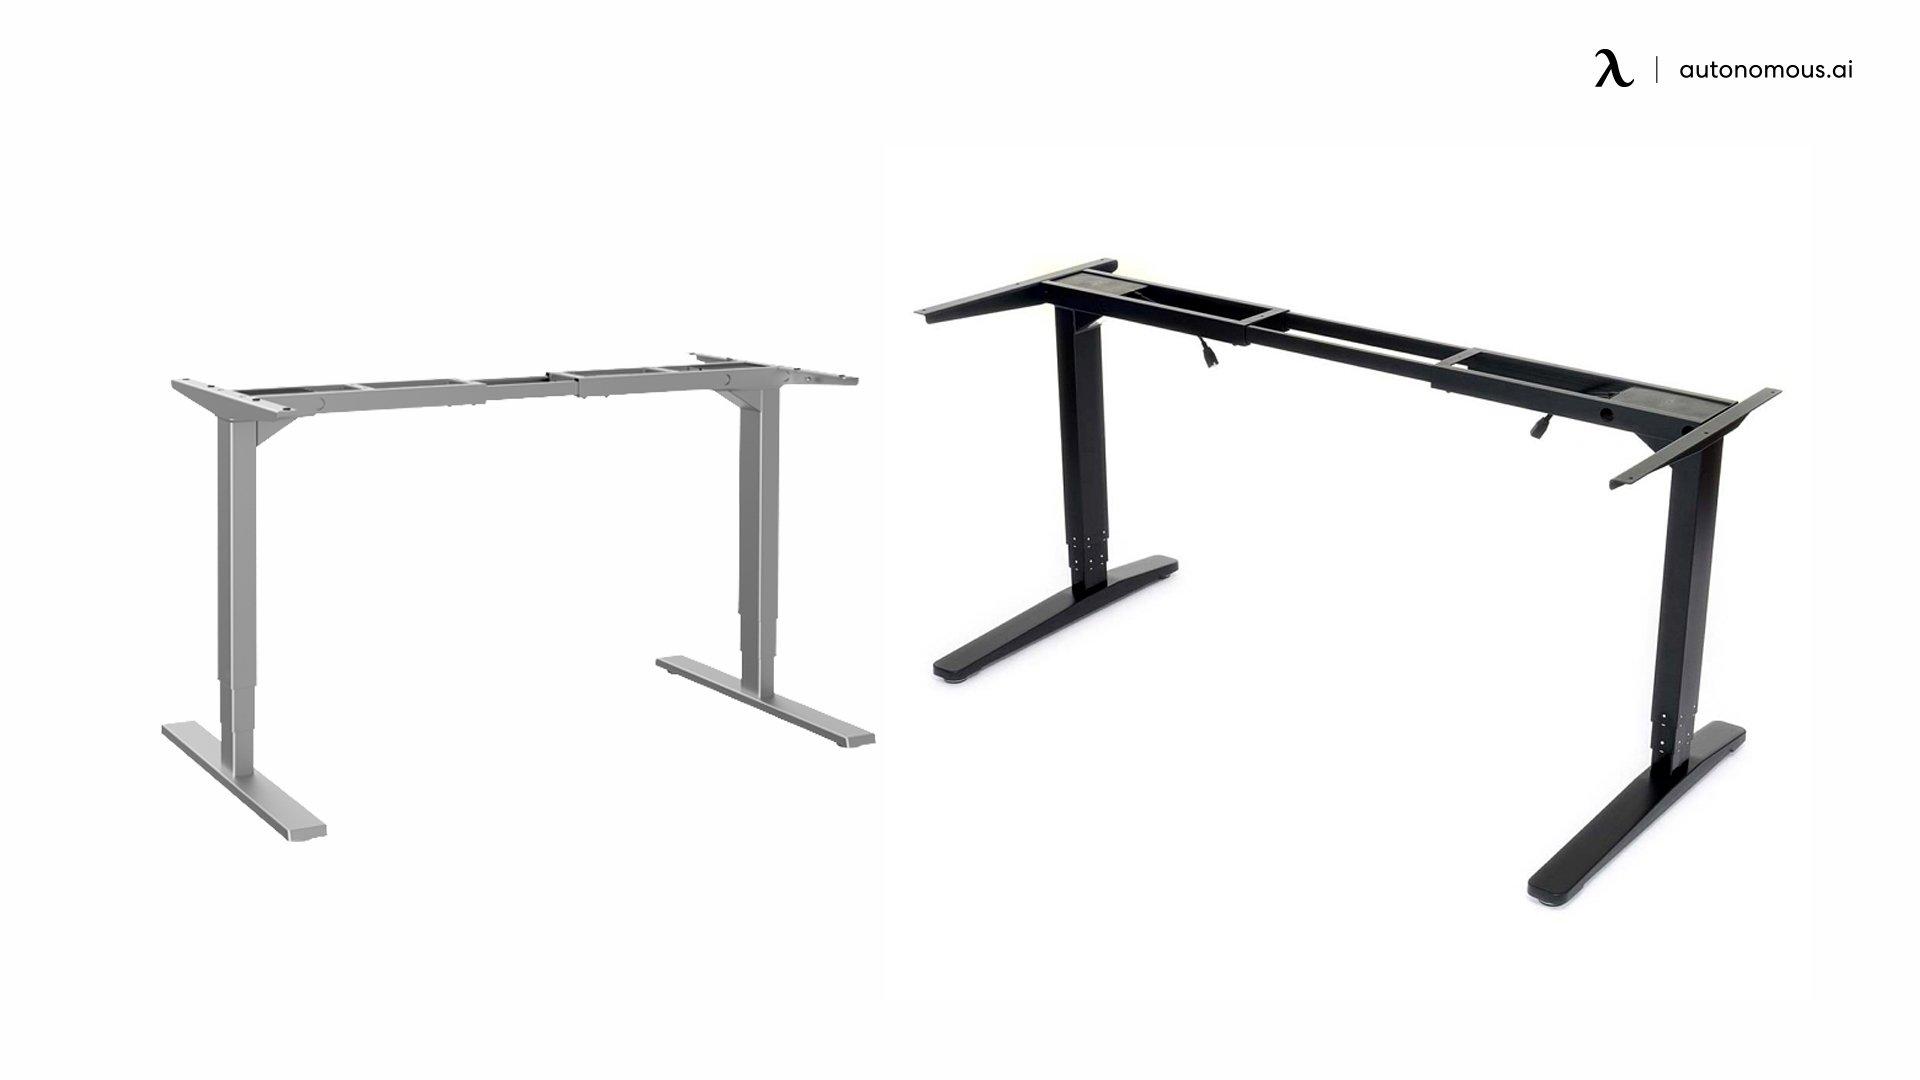 Jiecang Electric Adjustable Standing Desk Frame Structure